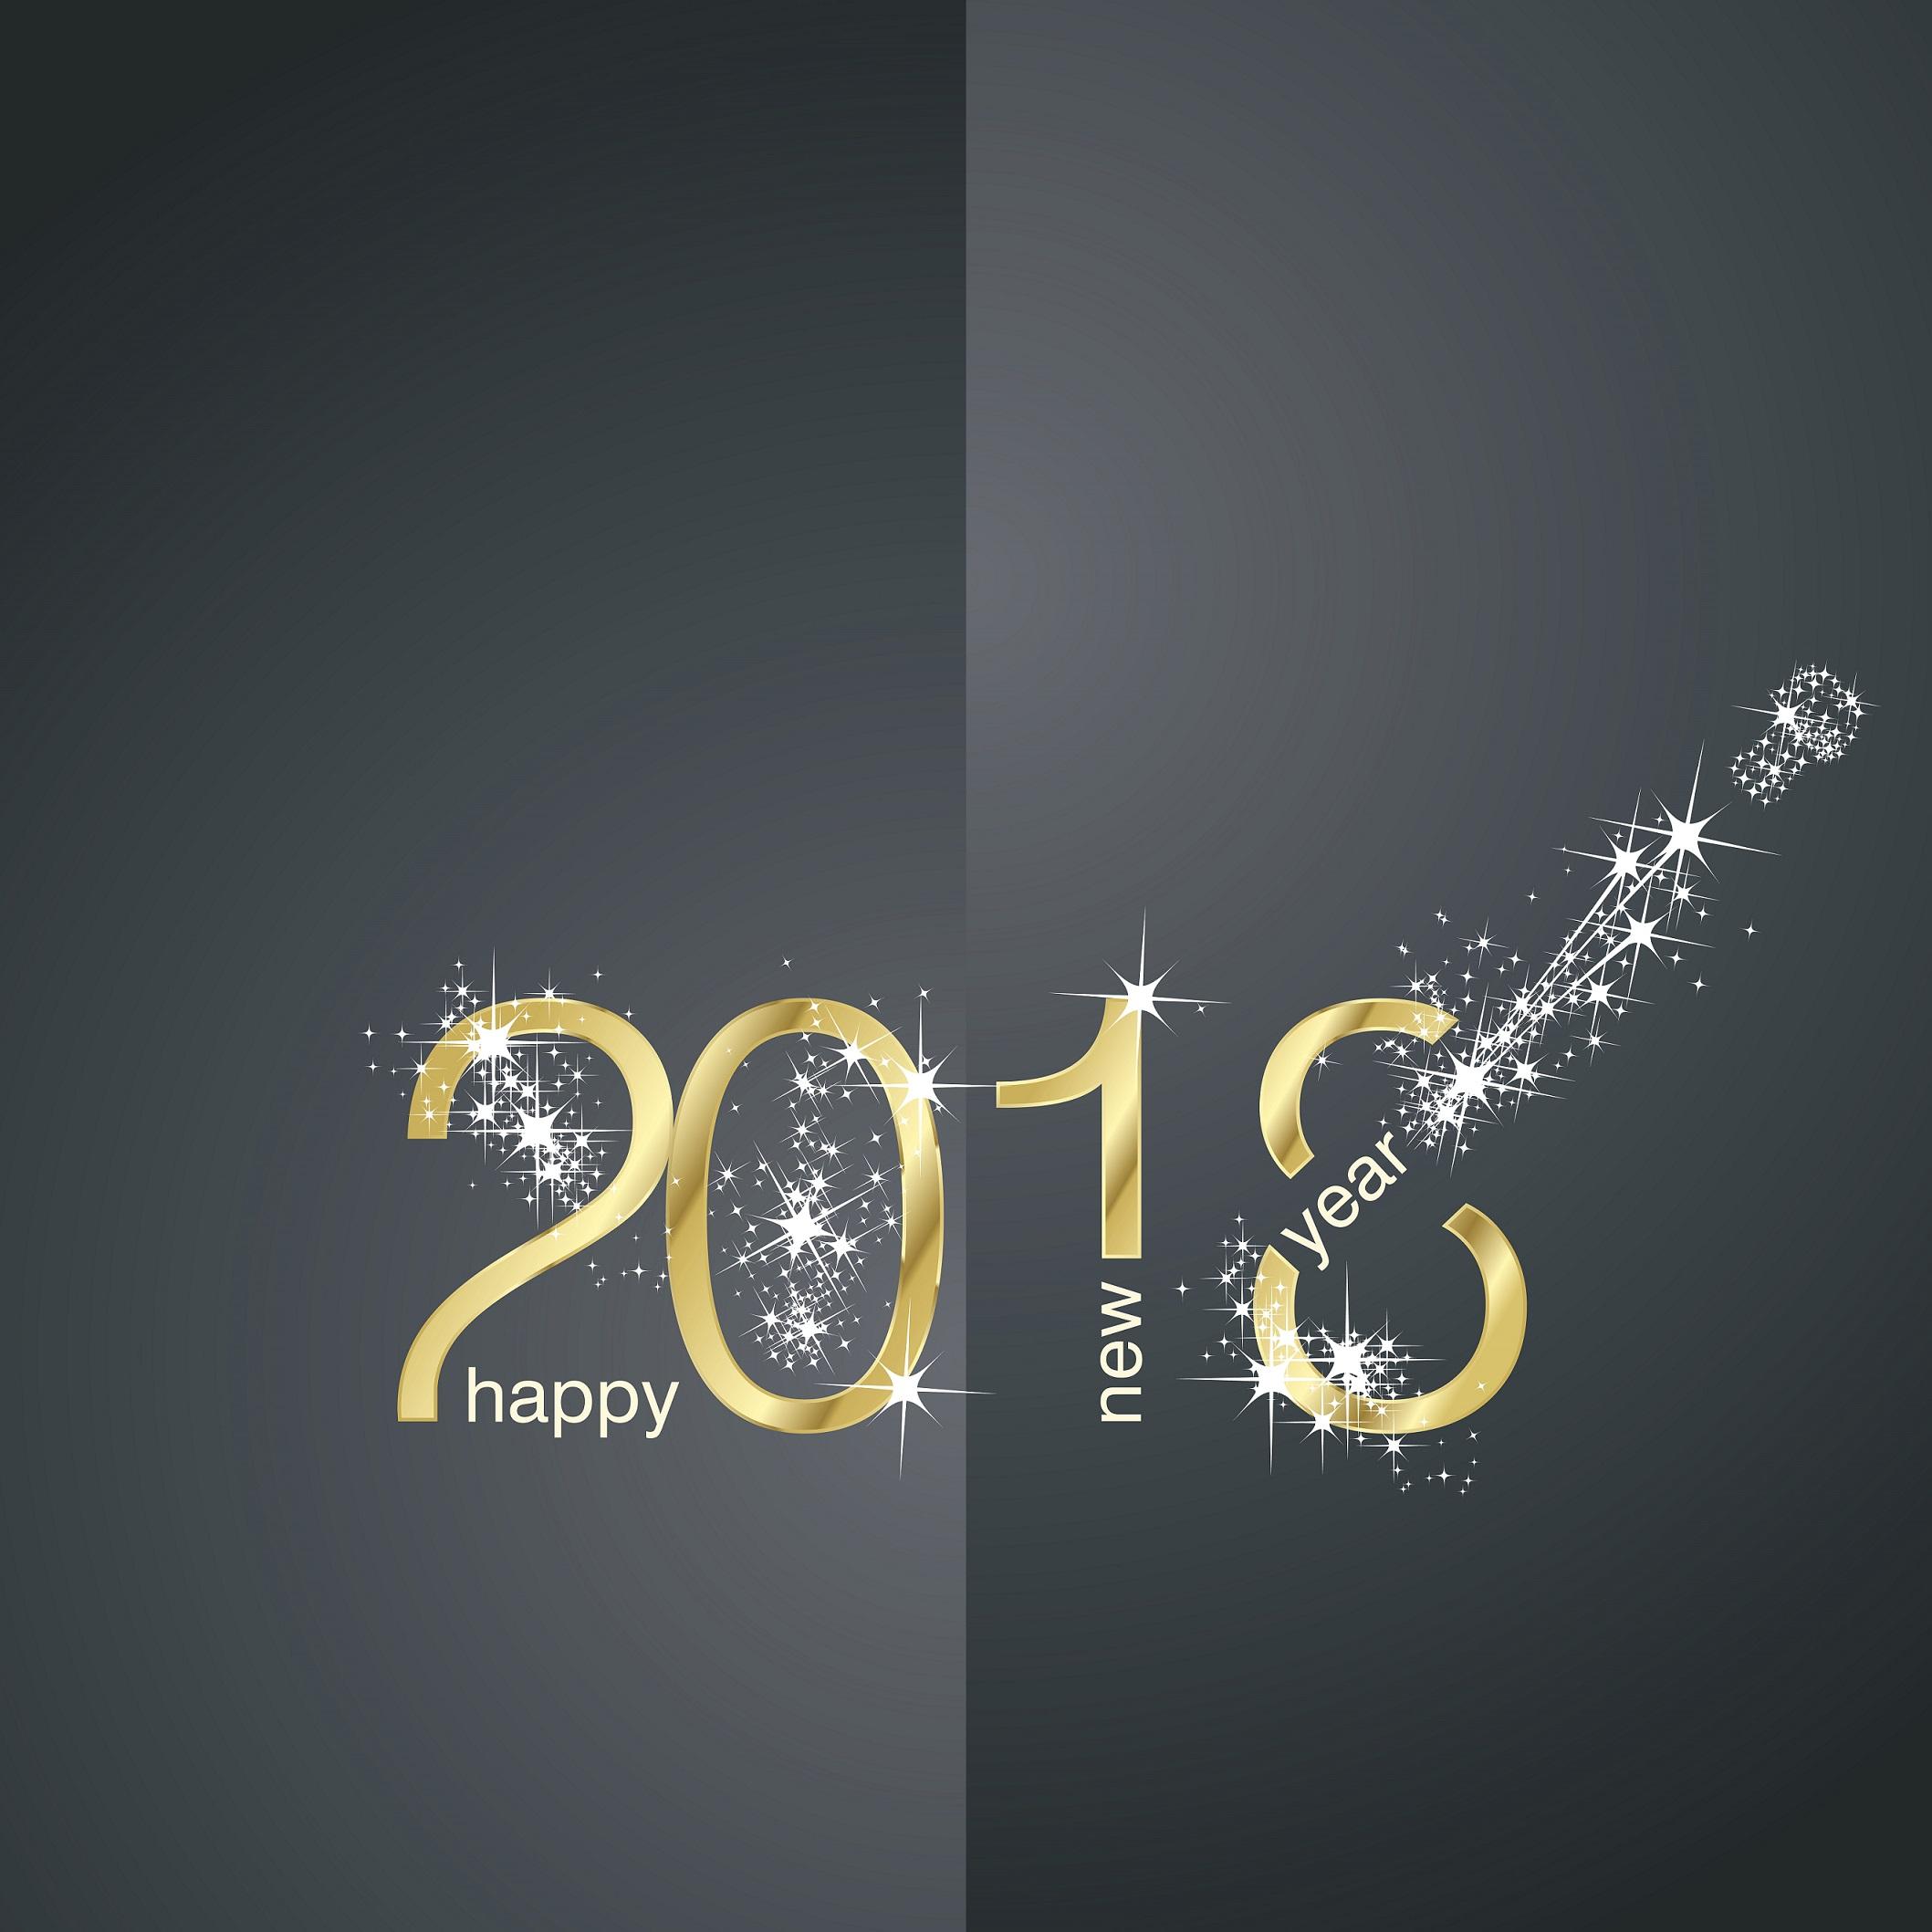 IATUL wishes you a Happy New Year!